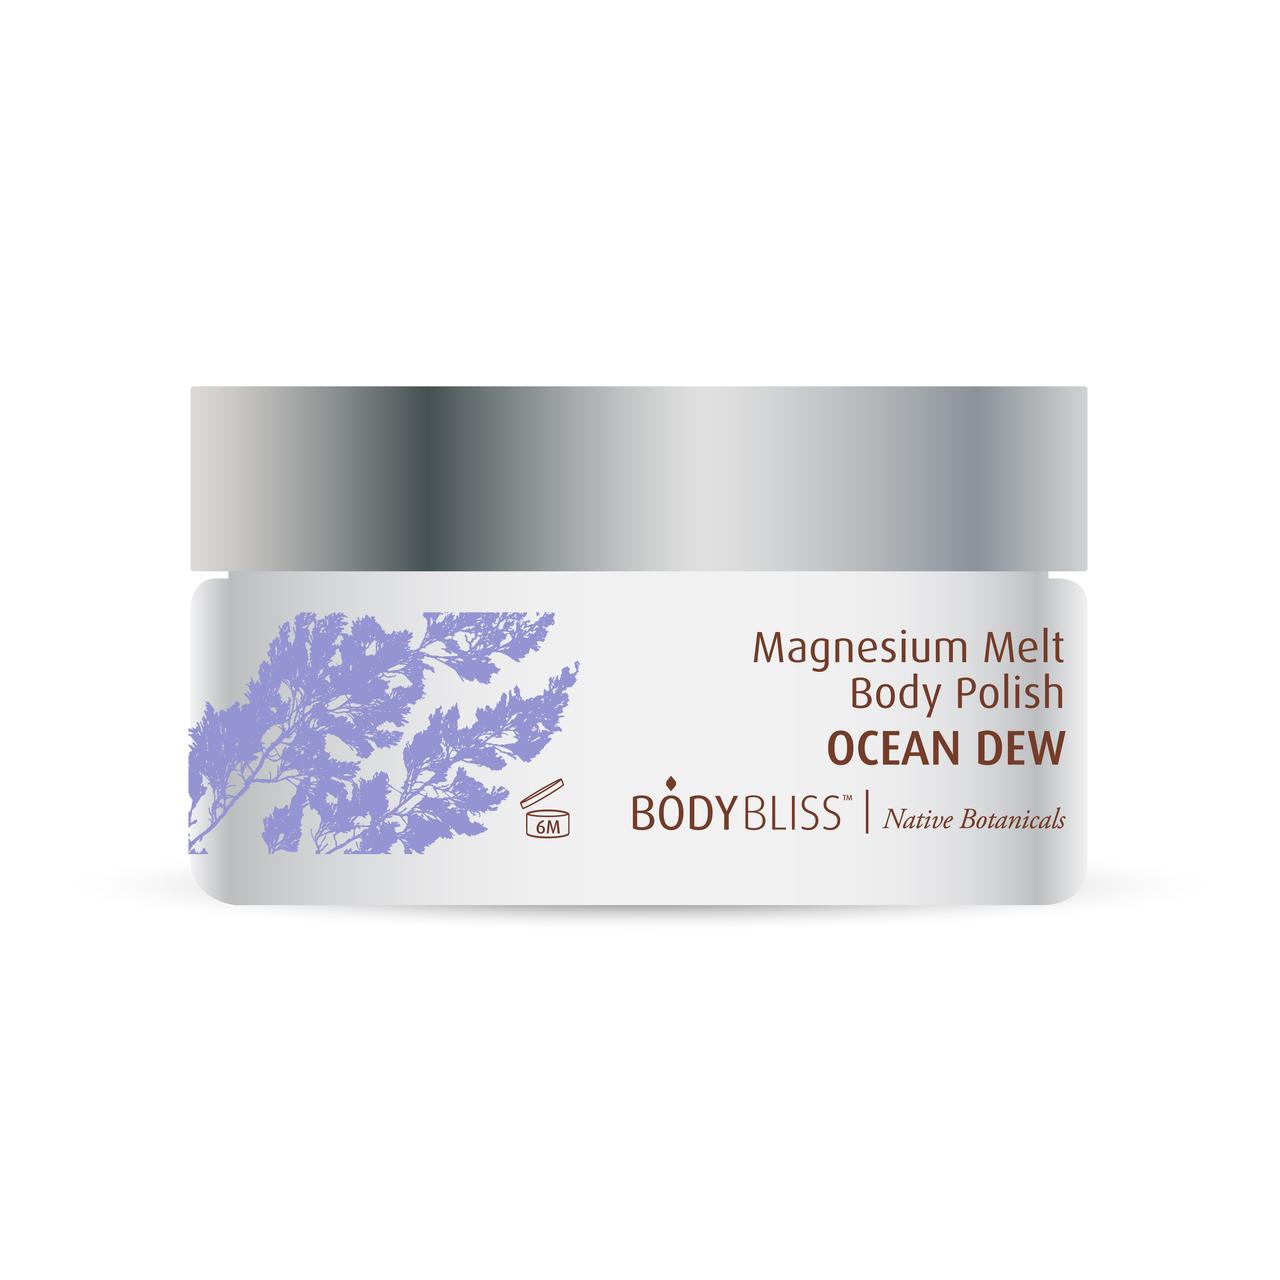 Ocean Dew Magnesium Melt Body Polish